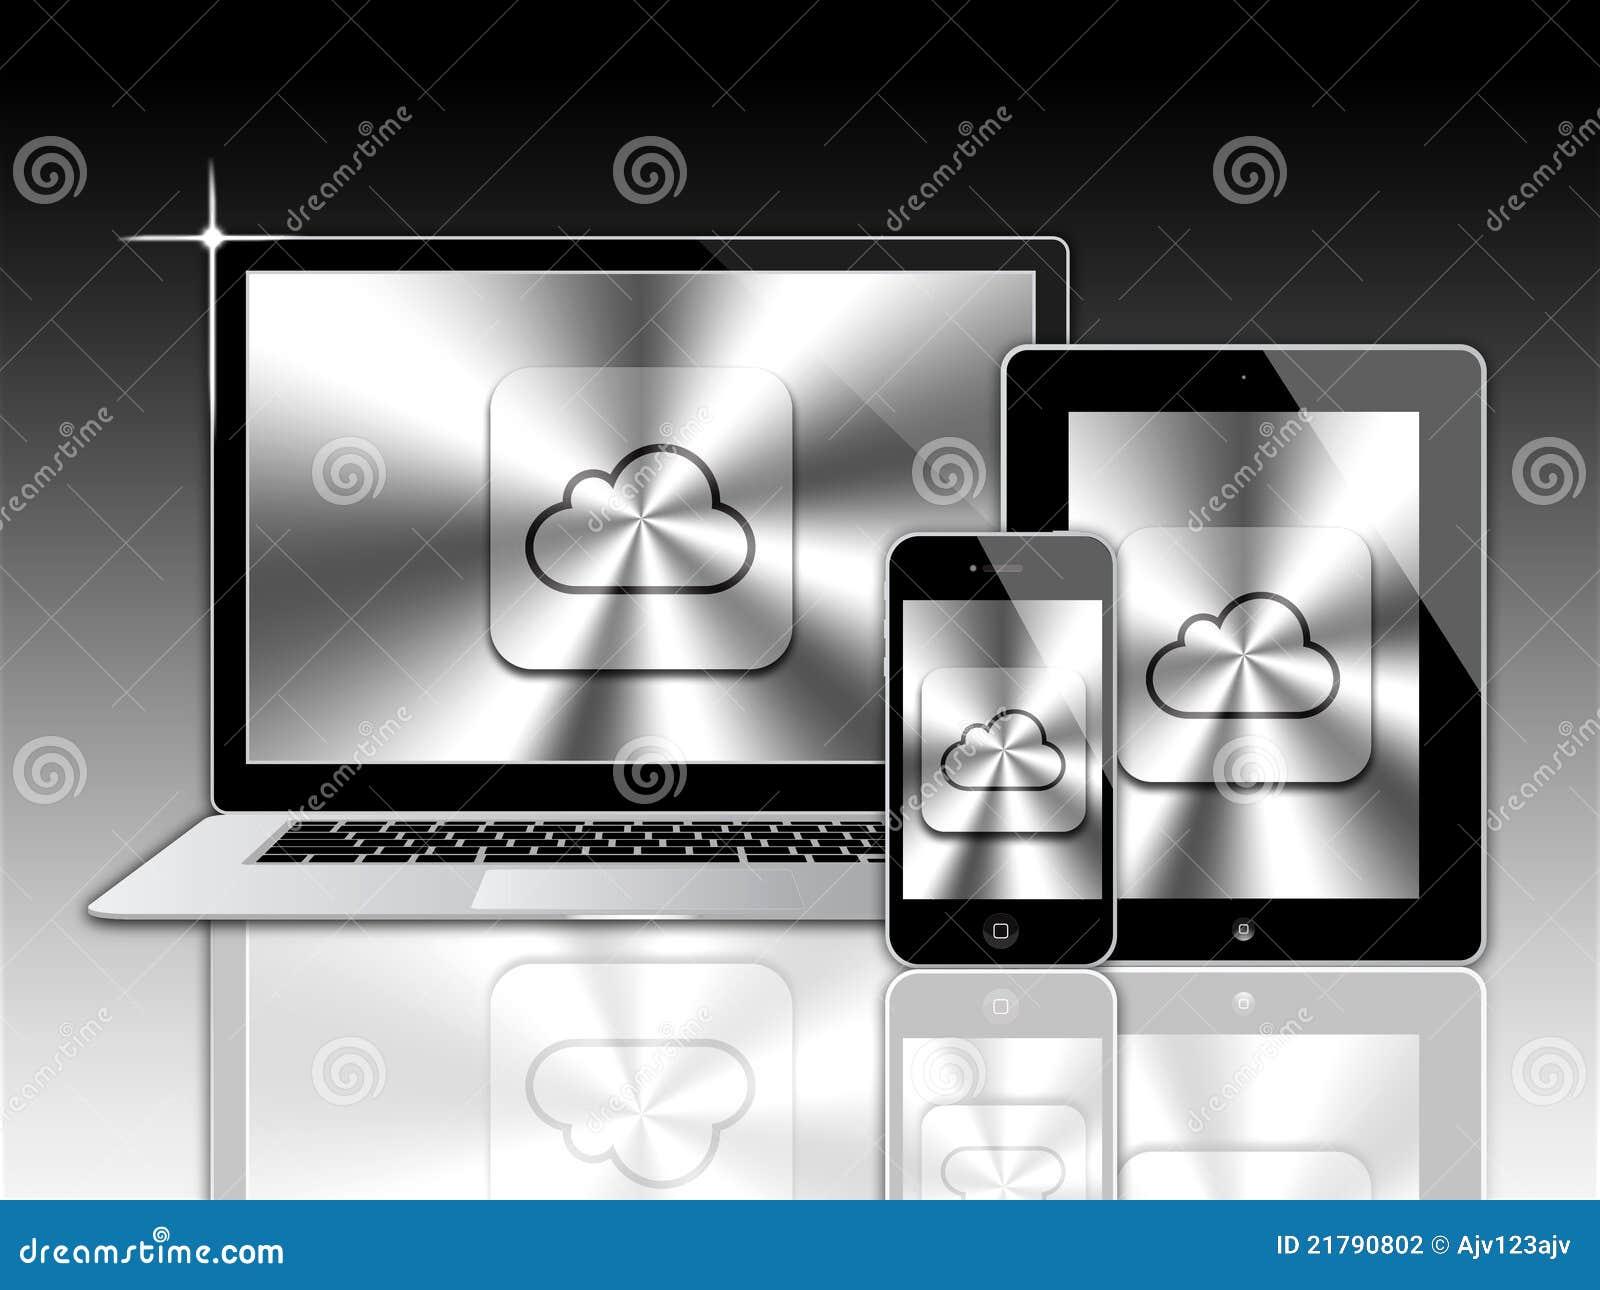 Apple Mac iCloud computer data organisation